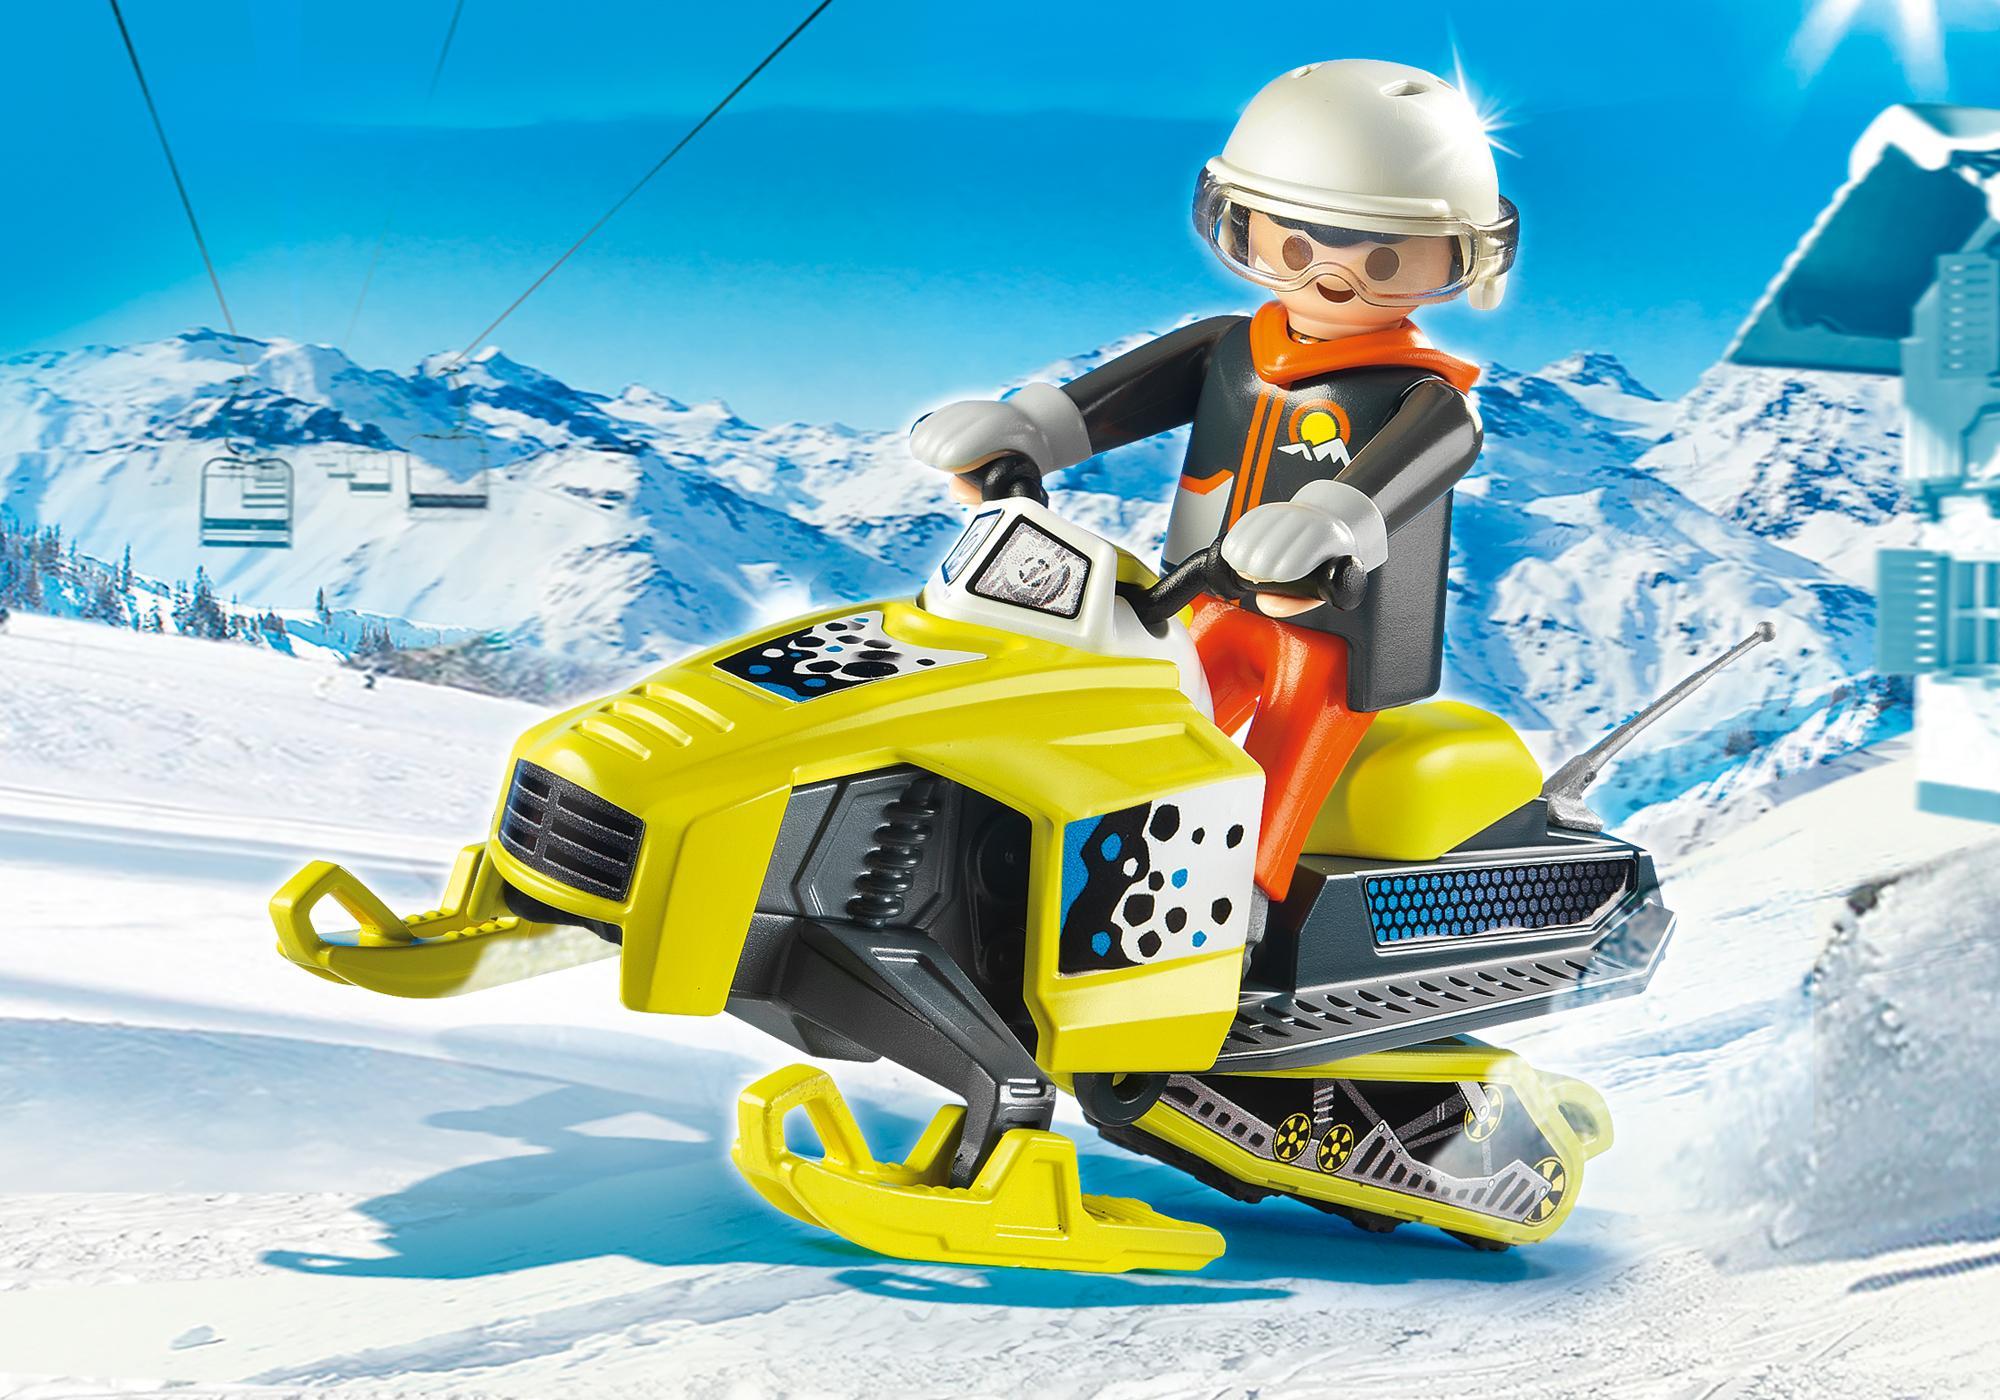 http://media.playmobil.com/i/playmobil/9285_product_detail/Snescooter